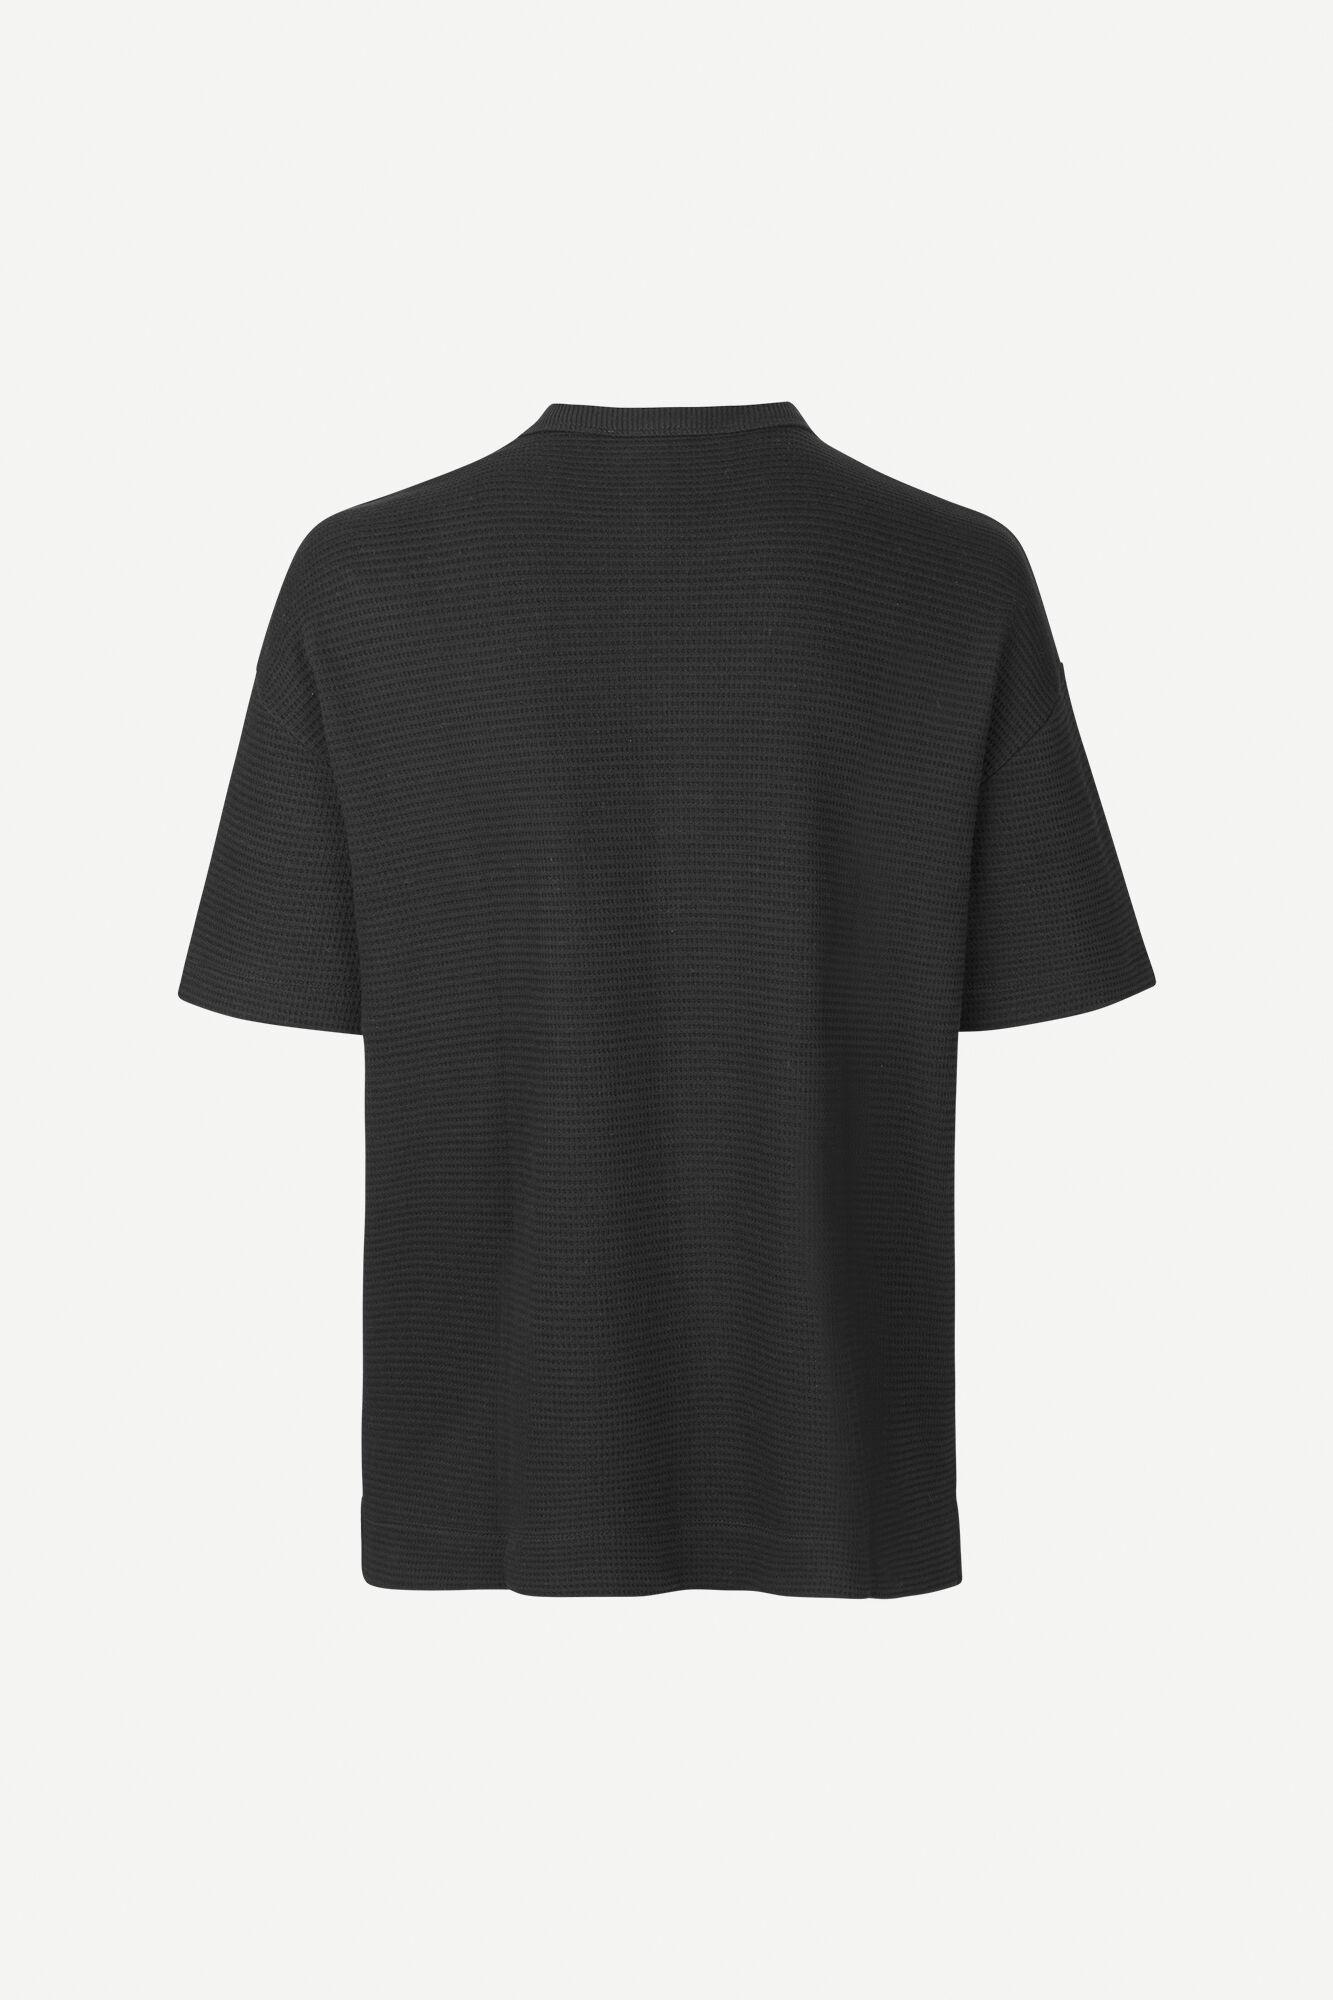 Ratano t-shirt 11583